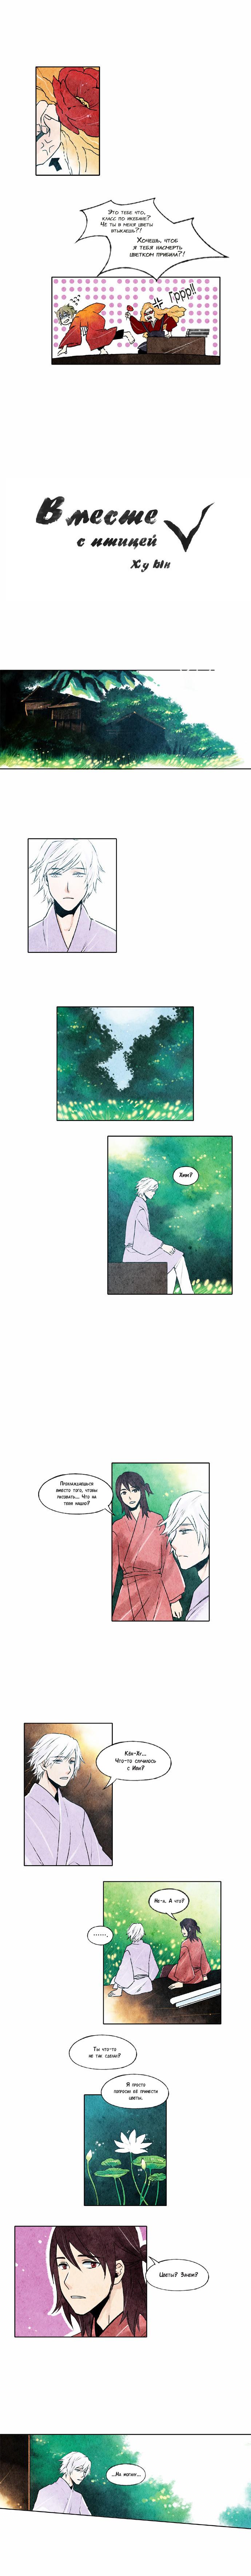 https://r1.ninemanga.com/comics/pic2/39/22503/416373/1532884263800.jpg Page 3